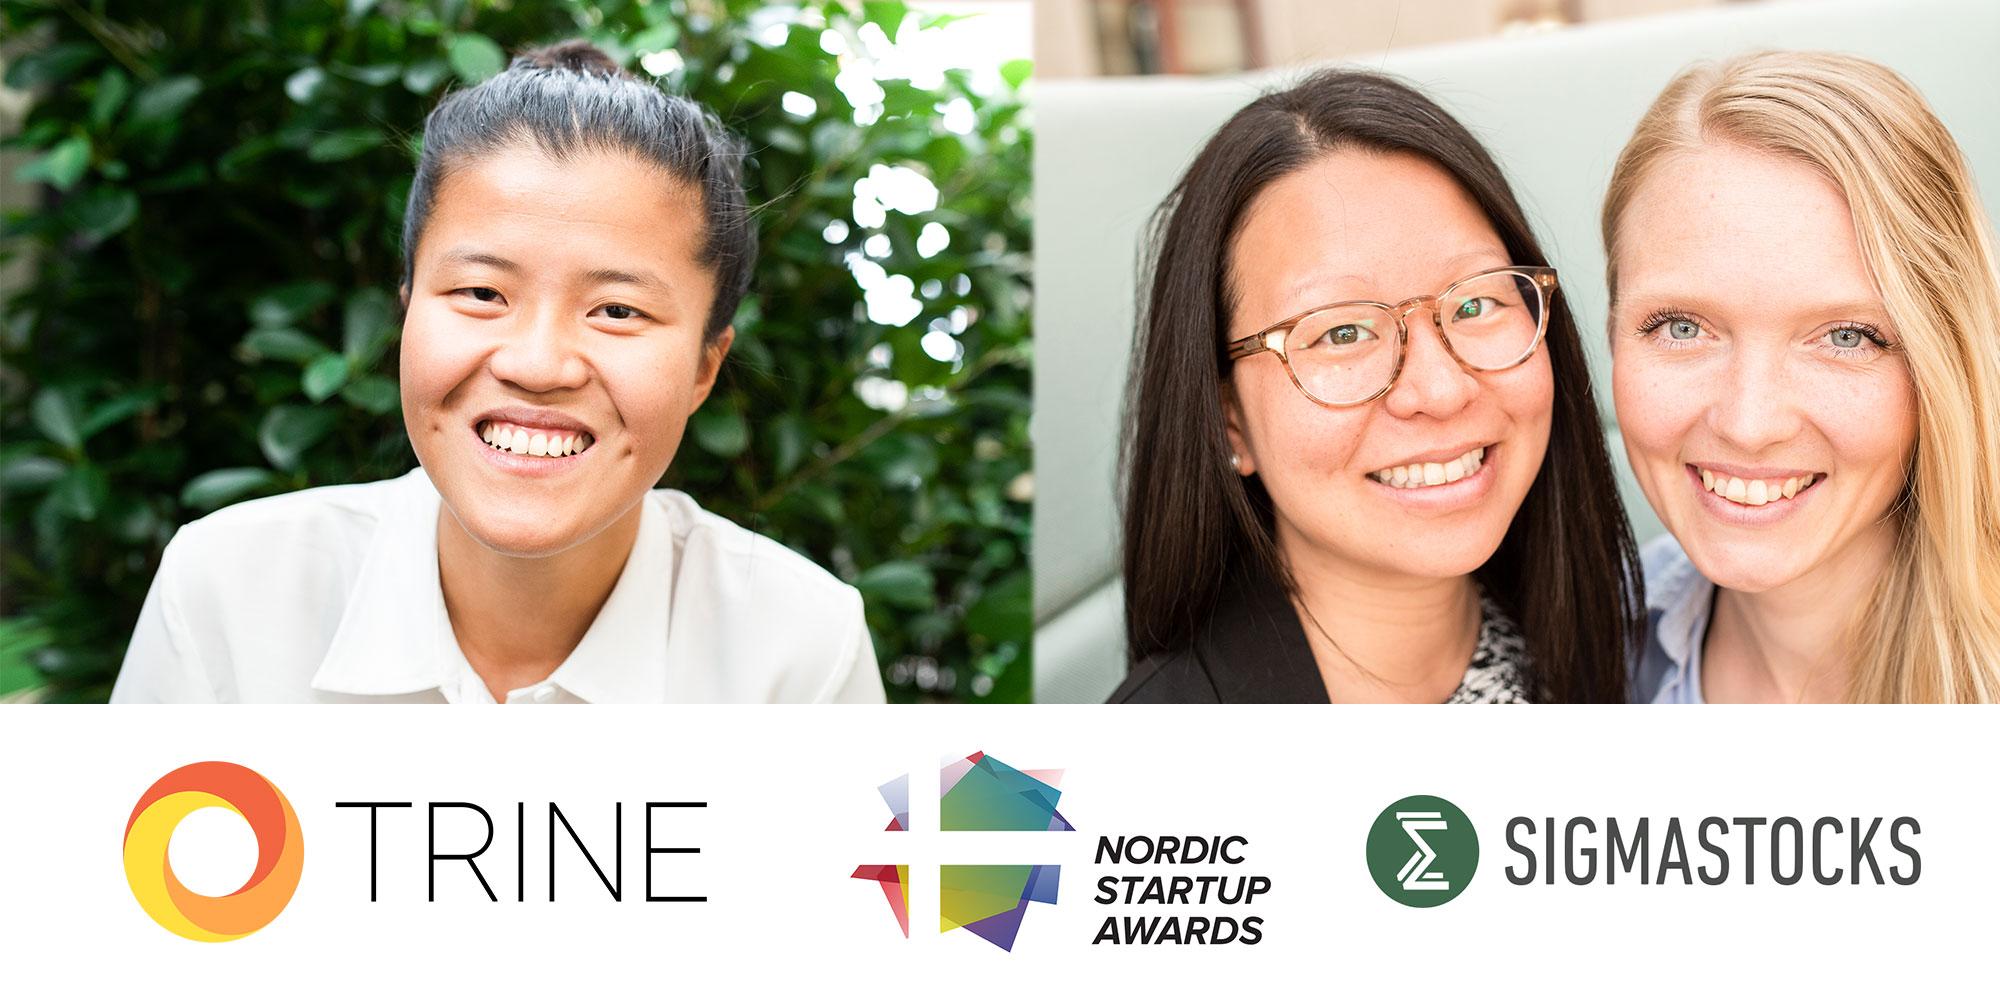 nordic-startup-awards-TRINE-Sigmastocks-Chalmers-Ventures